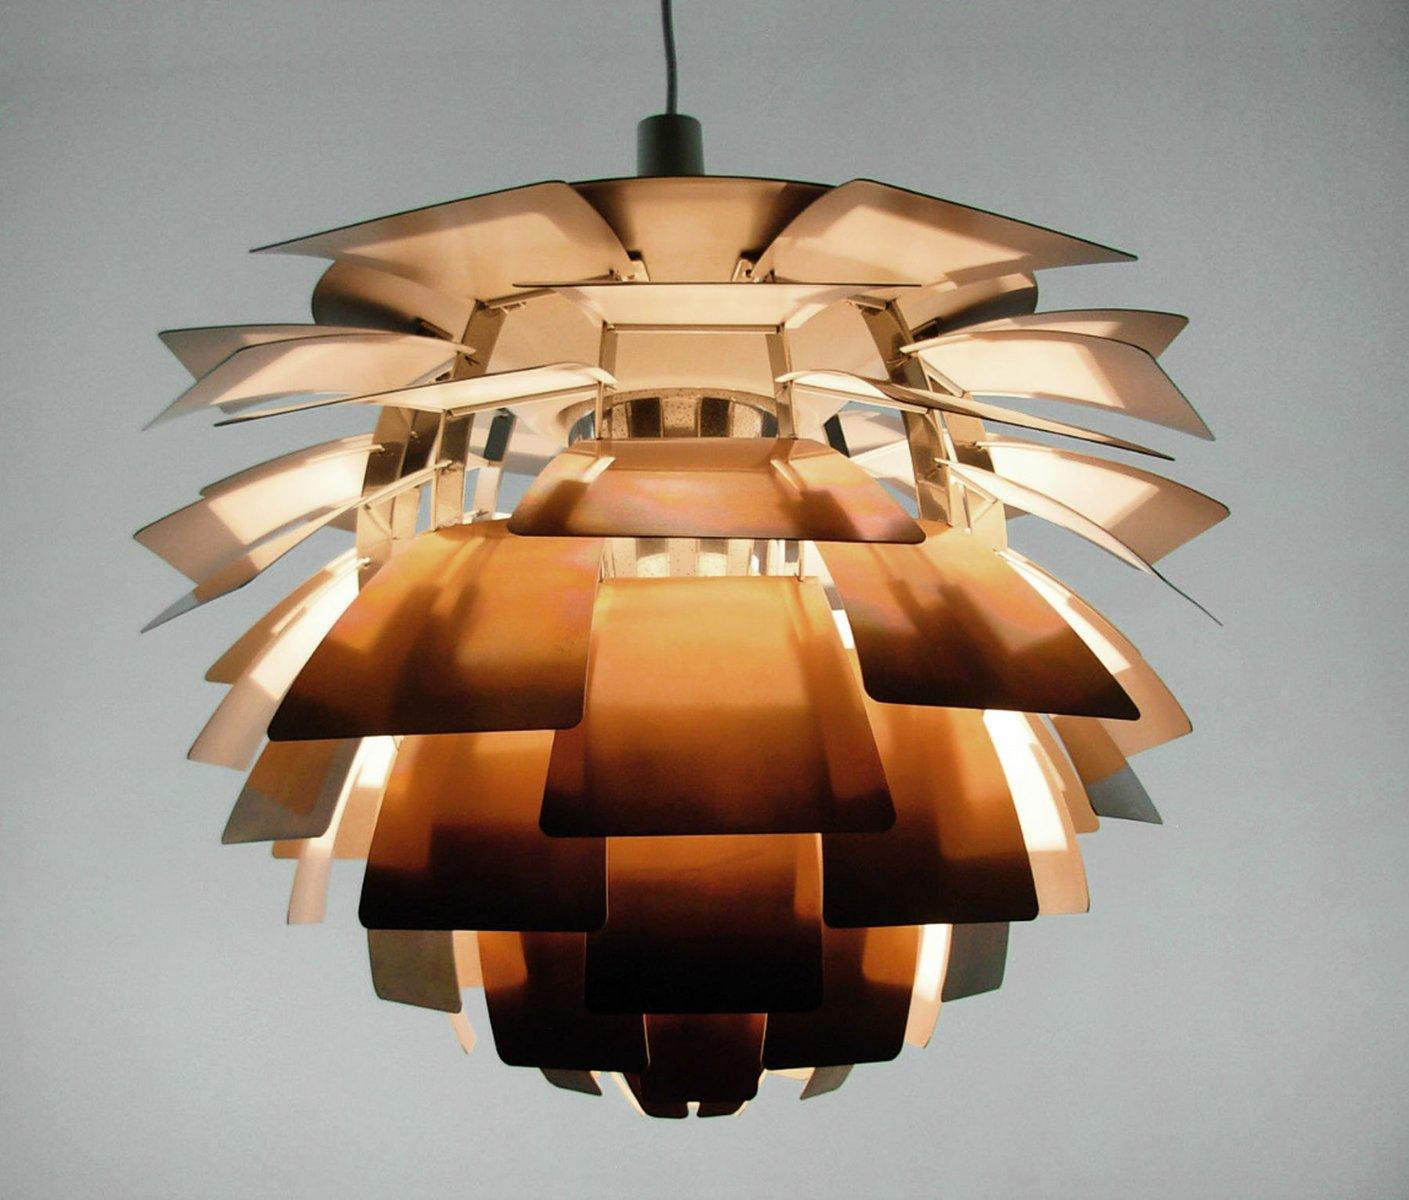 vintage artichoke lampe von poul henningsen f r louis poulsen bei pamono kaufen. Black Bedroom Furniture Sets. Home Design Ideas